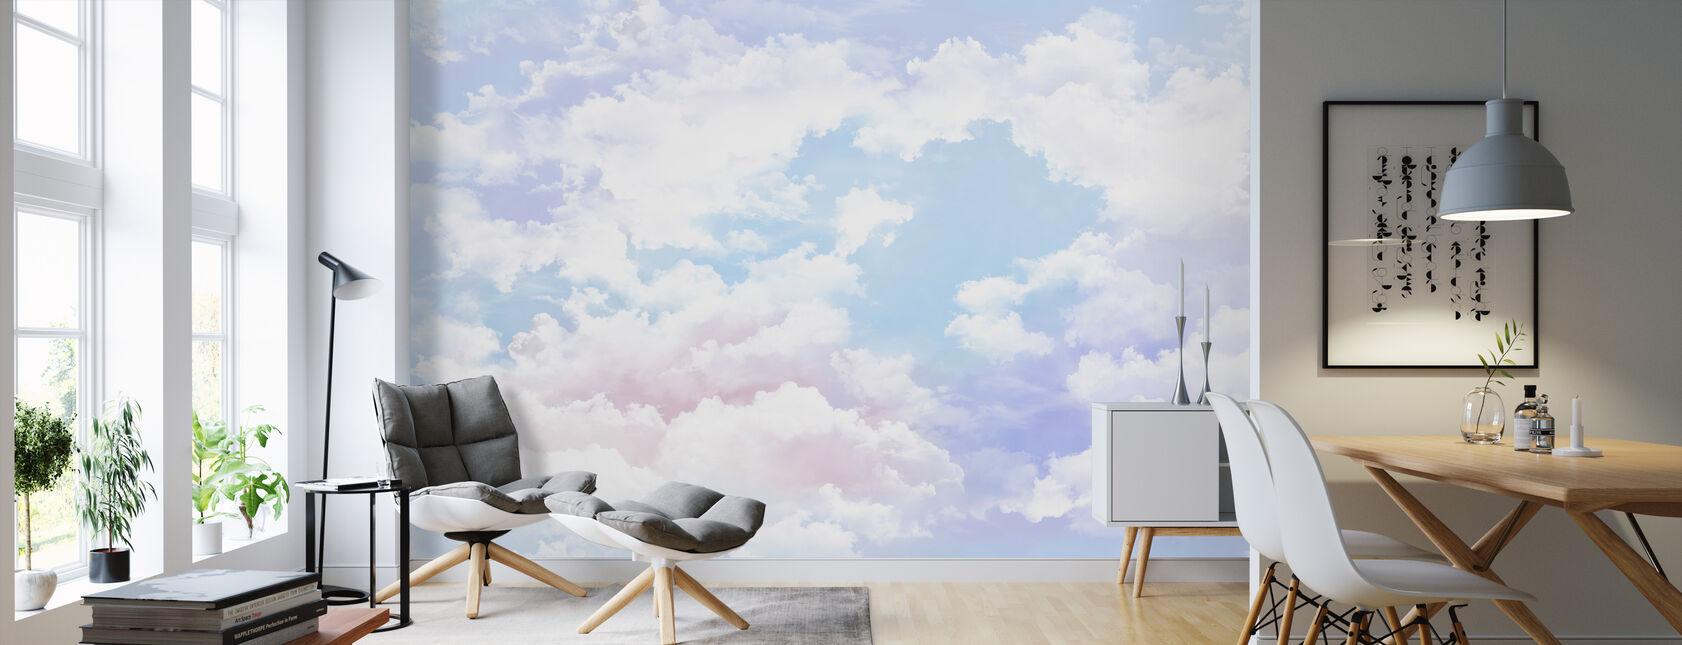 Into the Sky - Wallpaper - Living Room